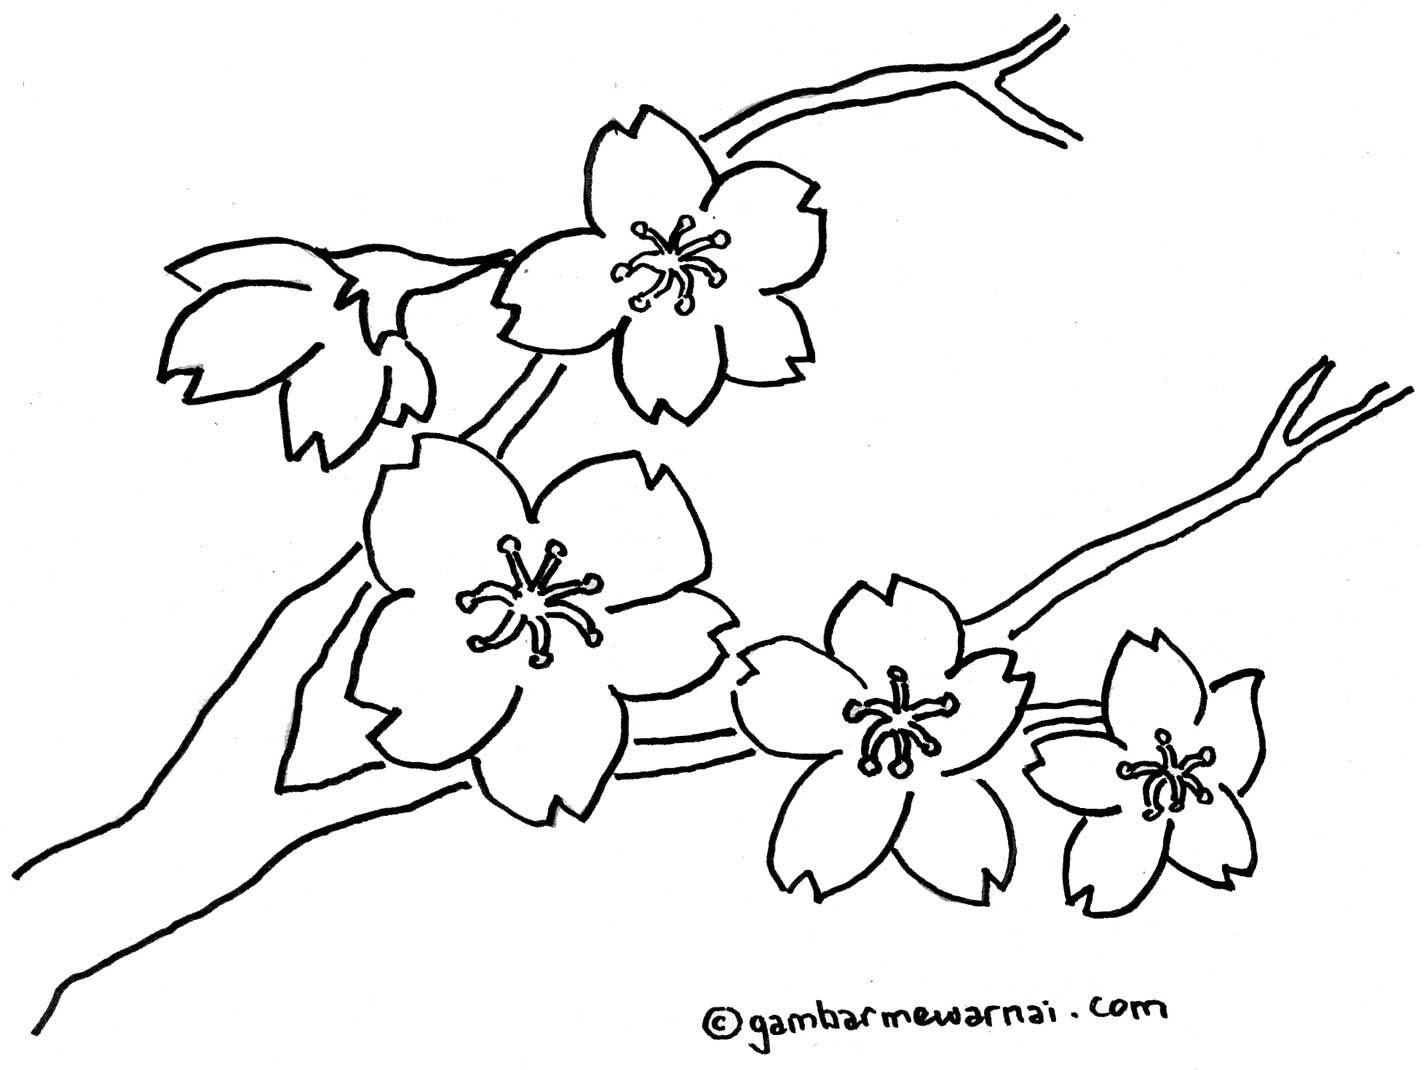 Amazing Gambar Bunga Sakura Untuk Diwarnai Ddeded Projects To